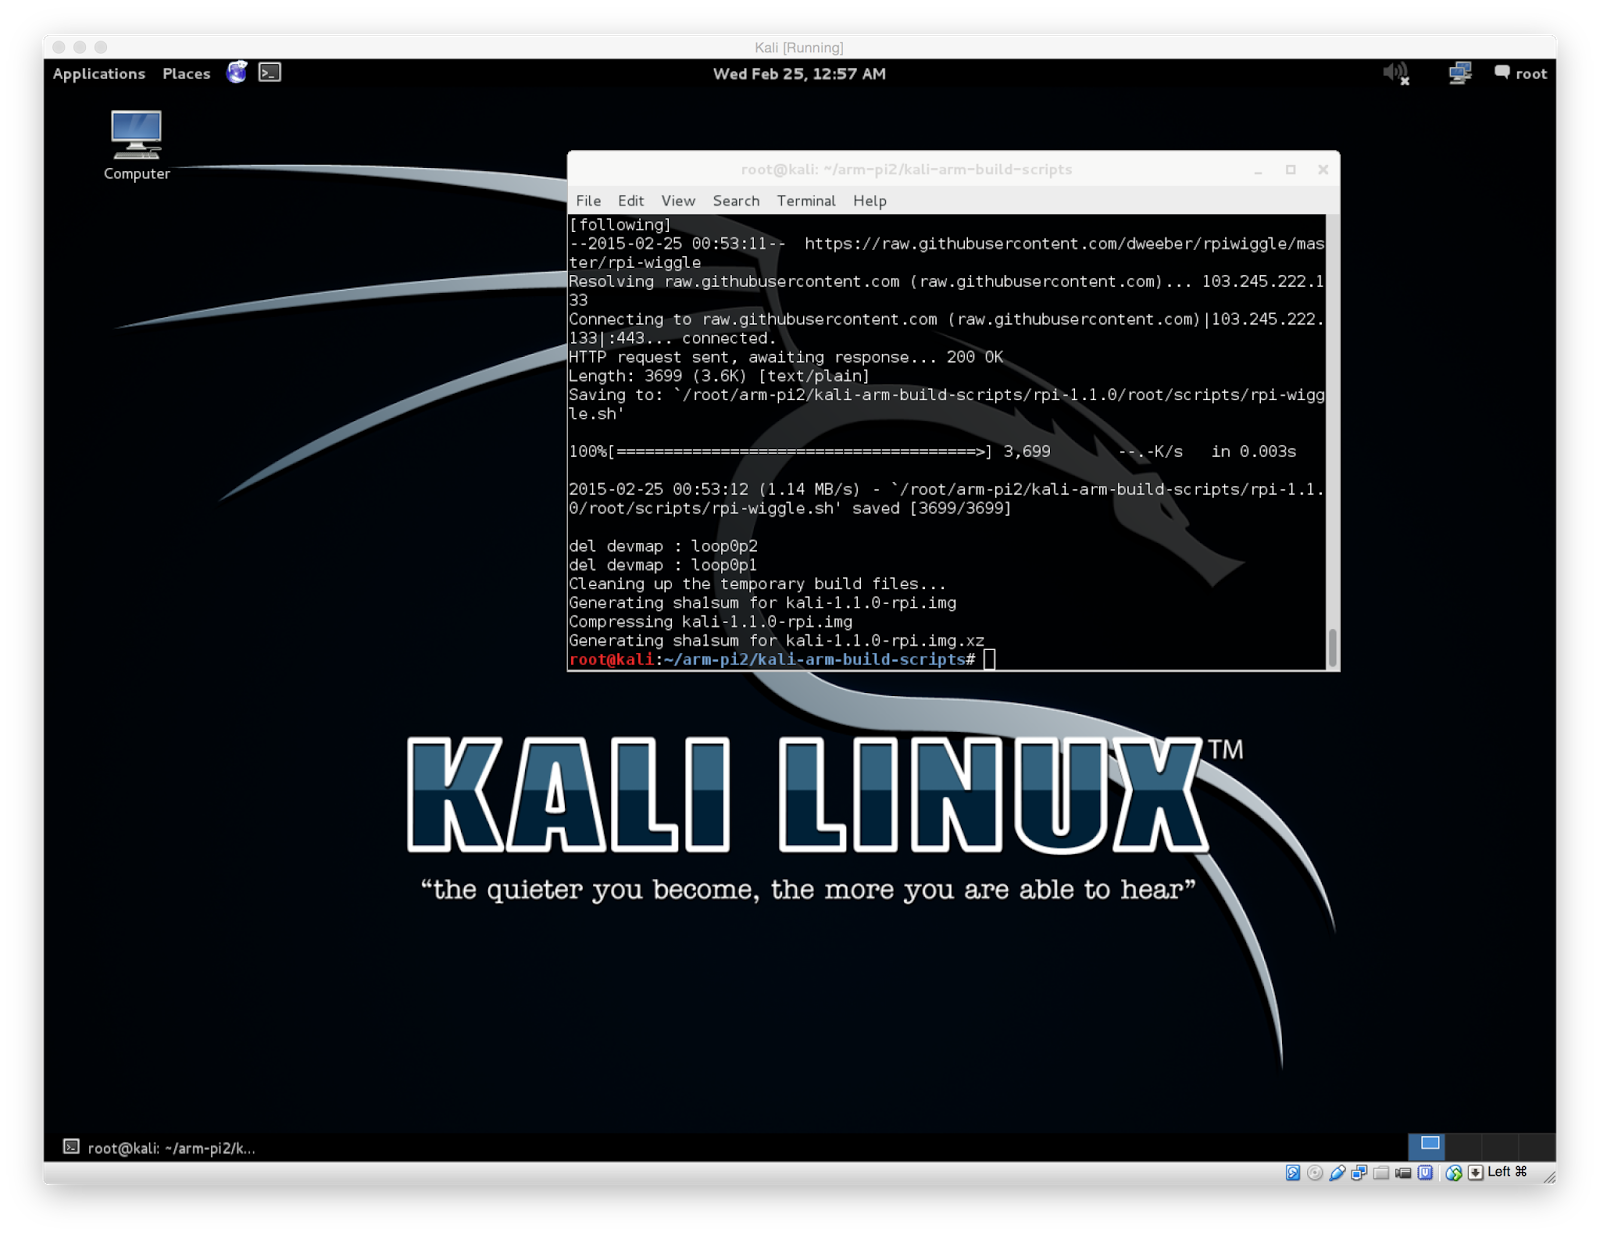 Kali linux raspberry pi 2 download image